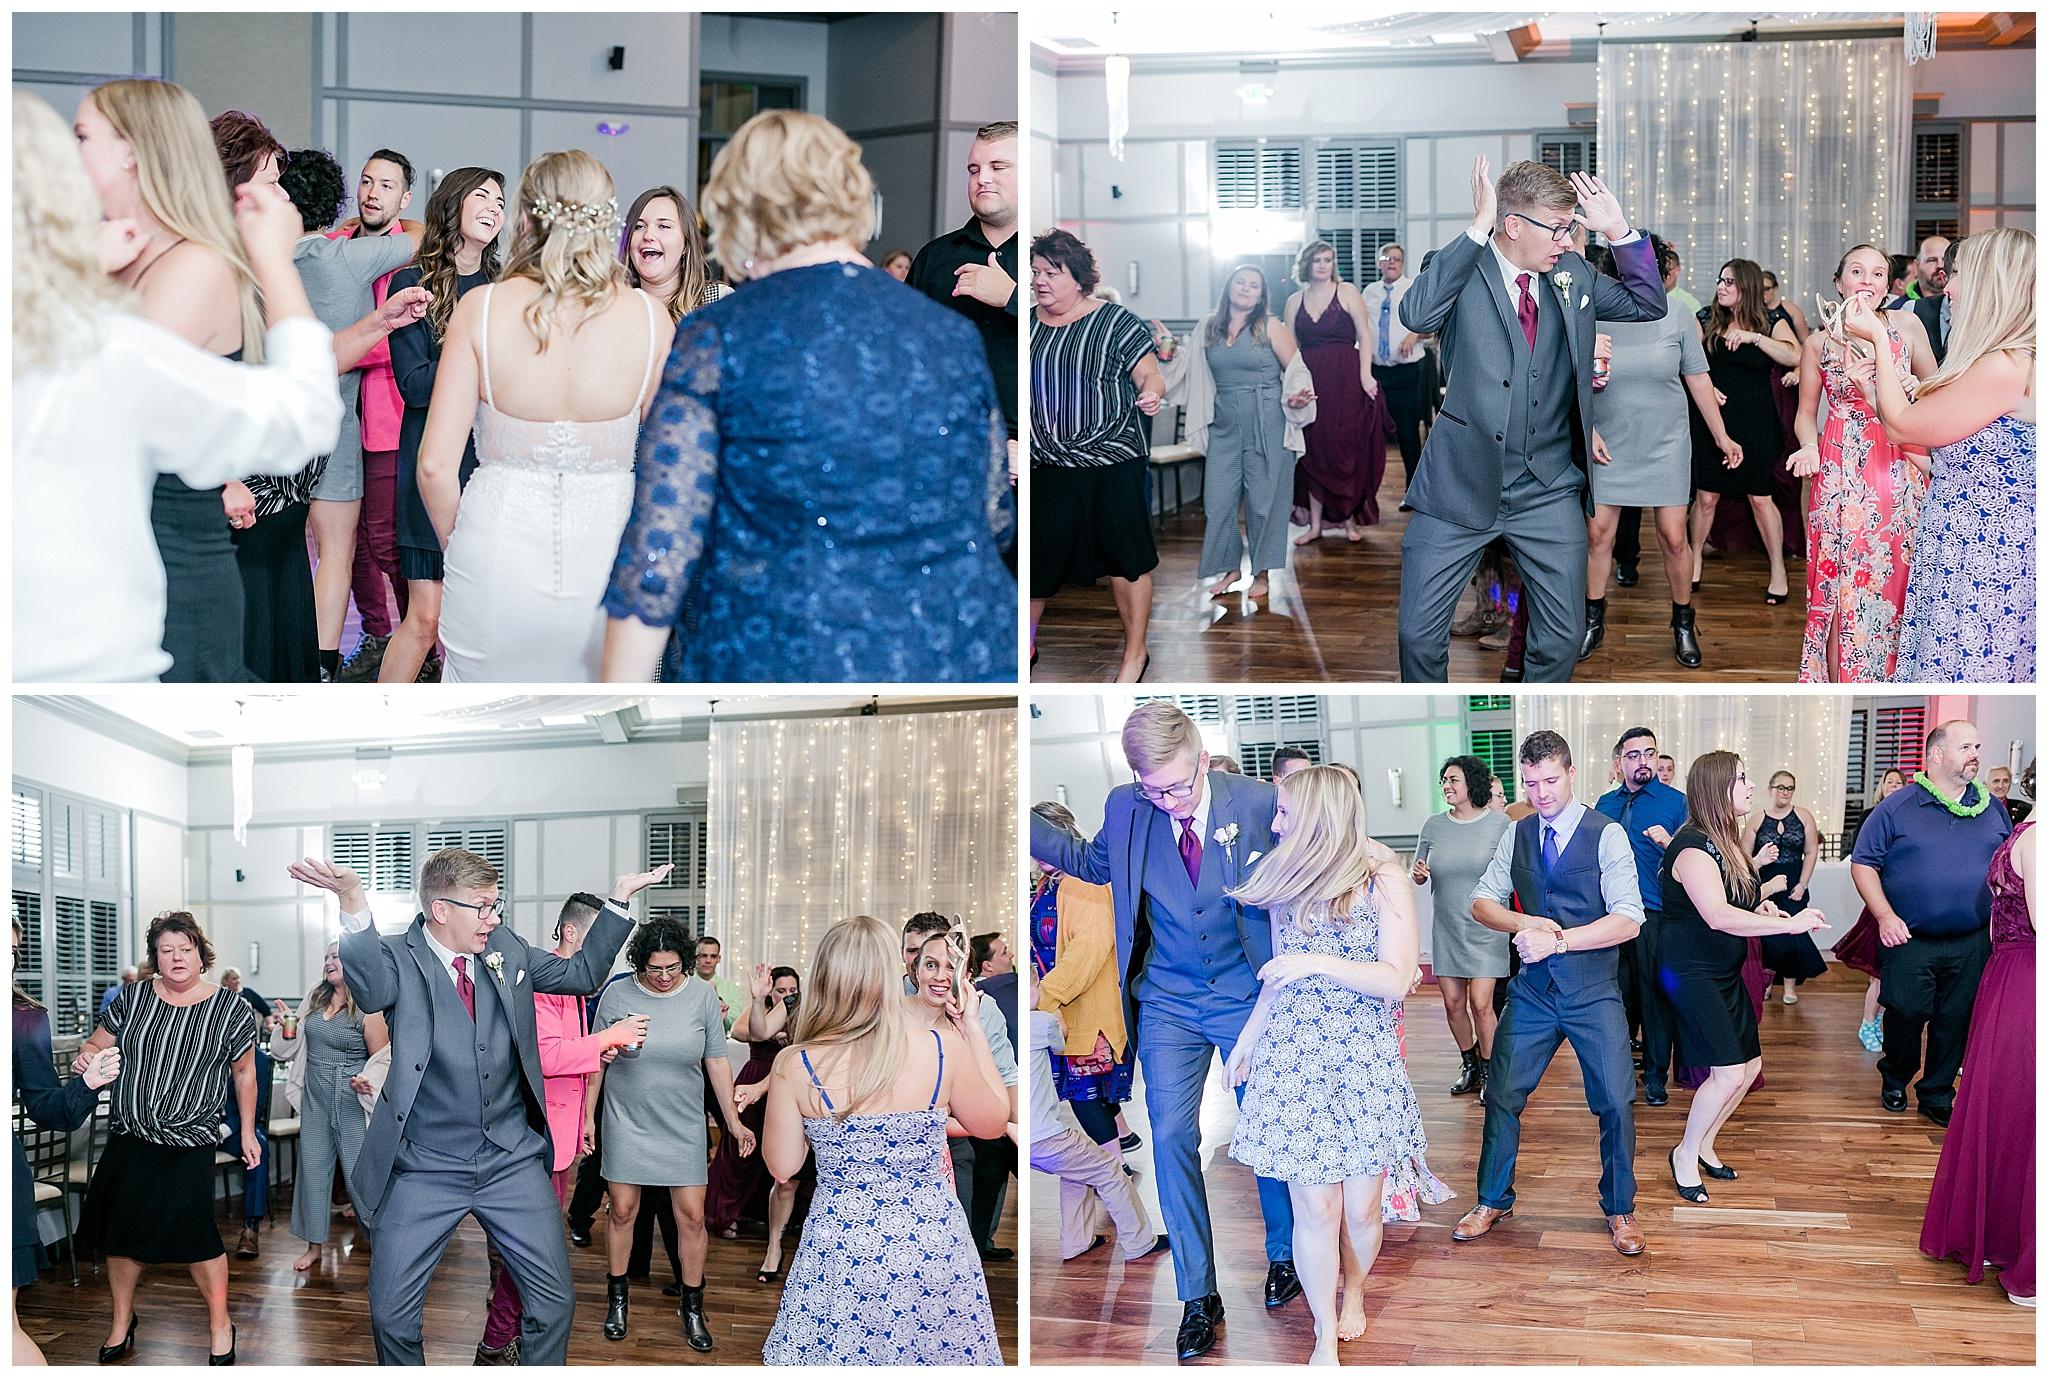 noahs_event_venue_sun_pairie_madison_wisconsin_wedding_photographers_0325.jpg